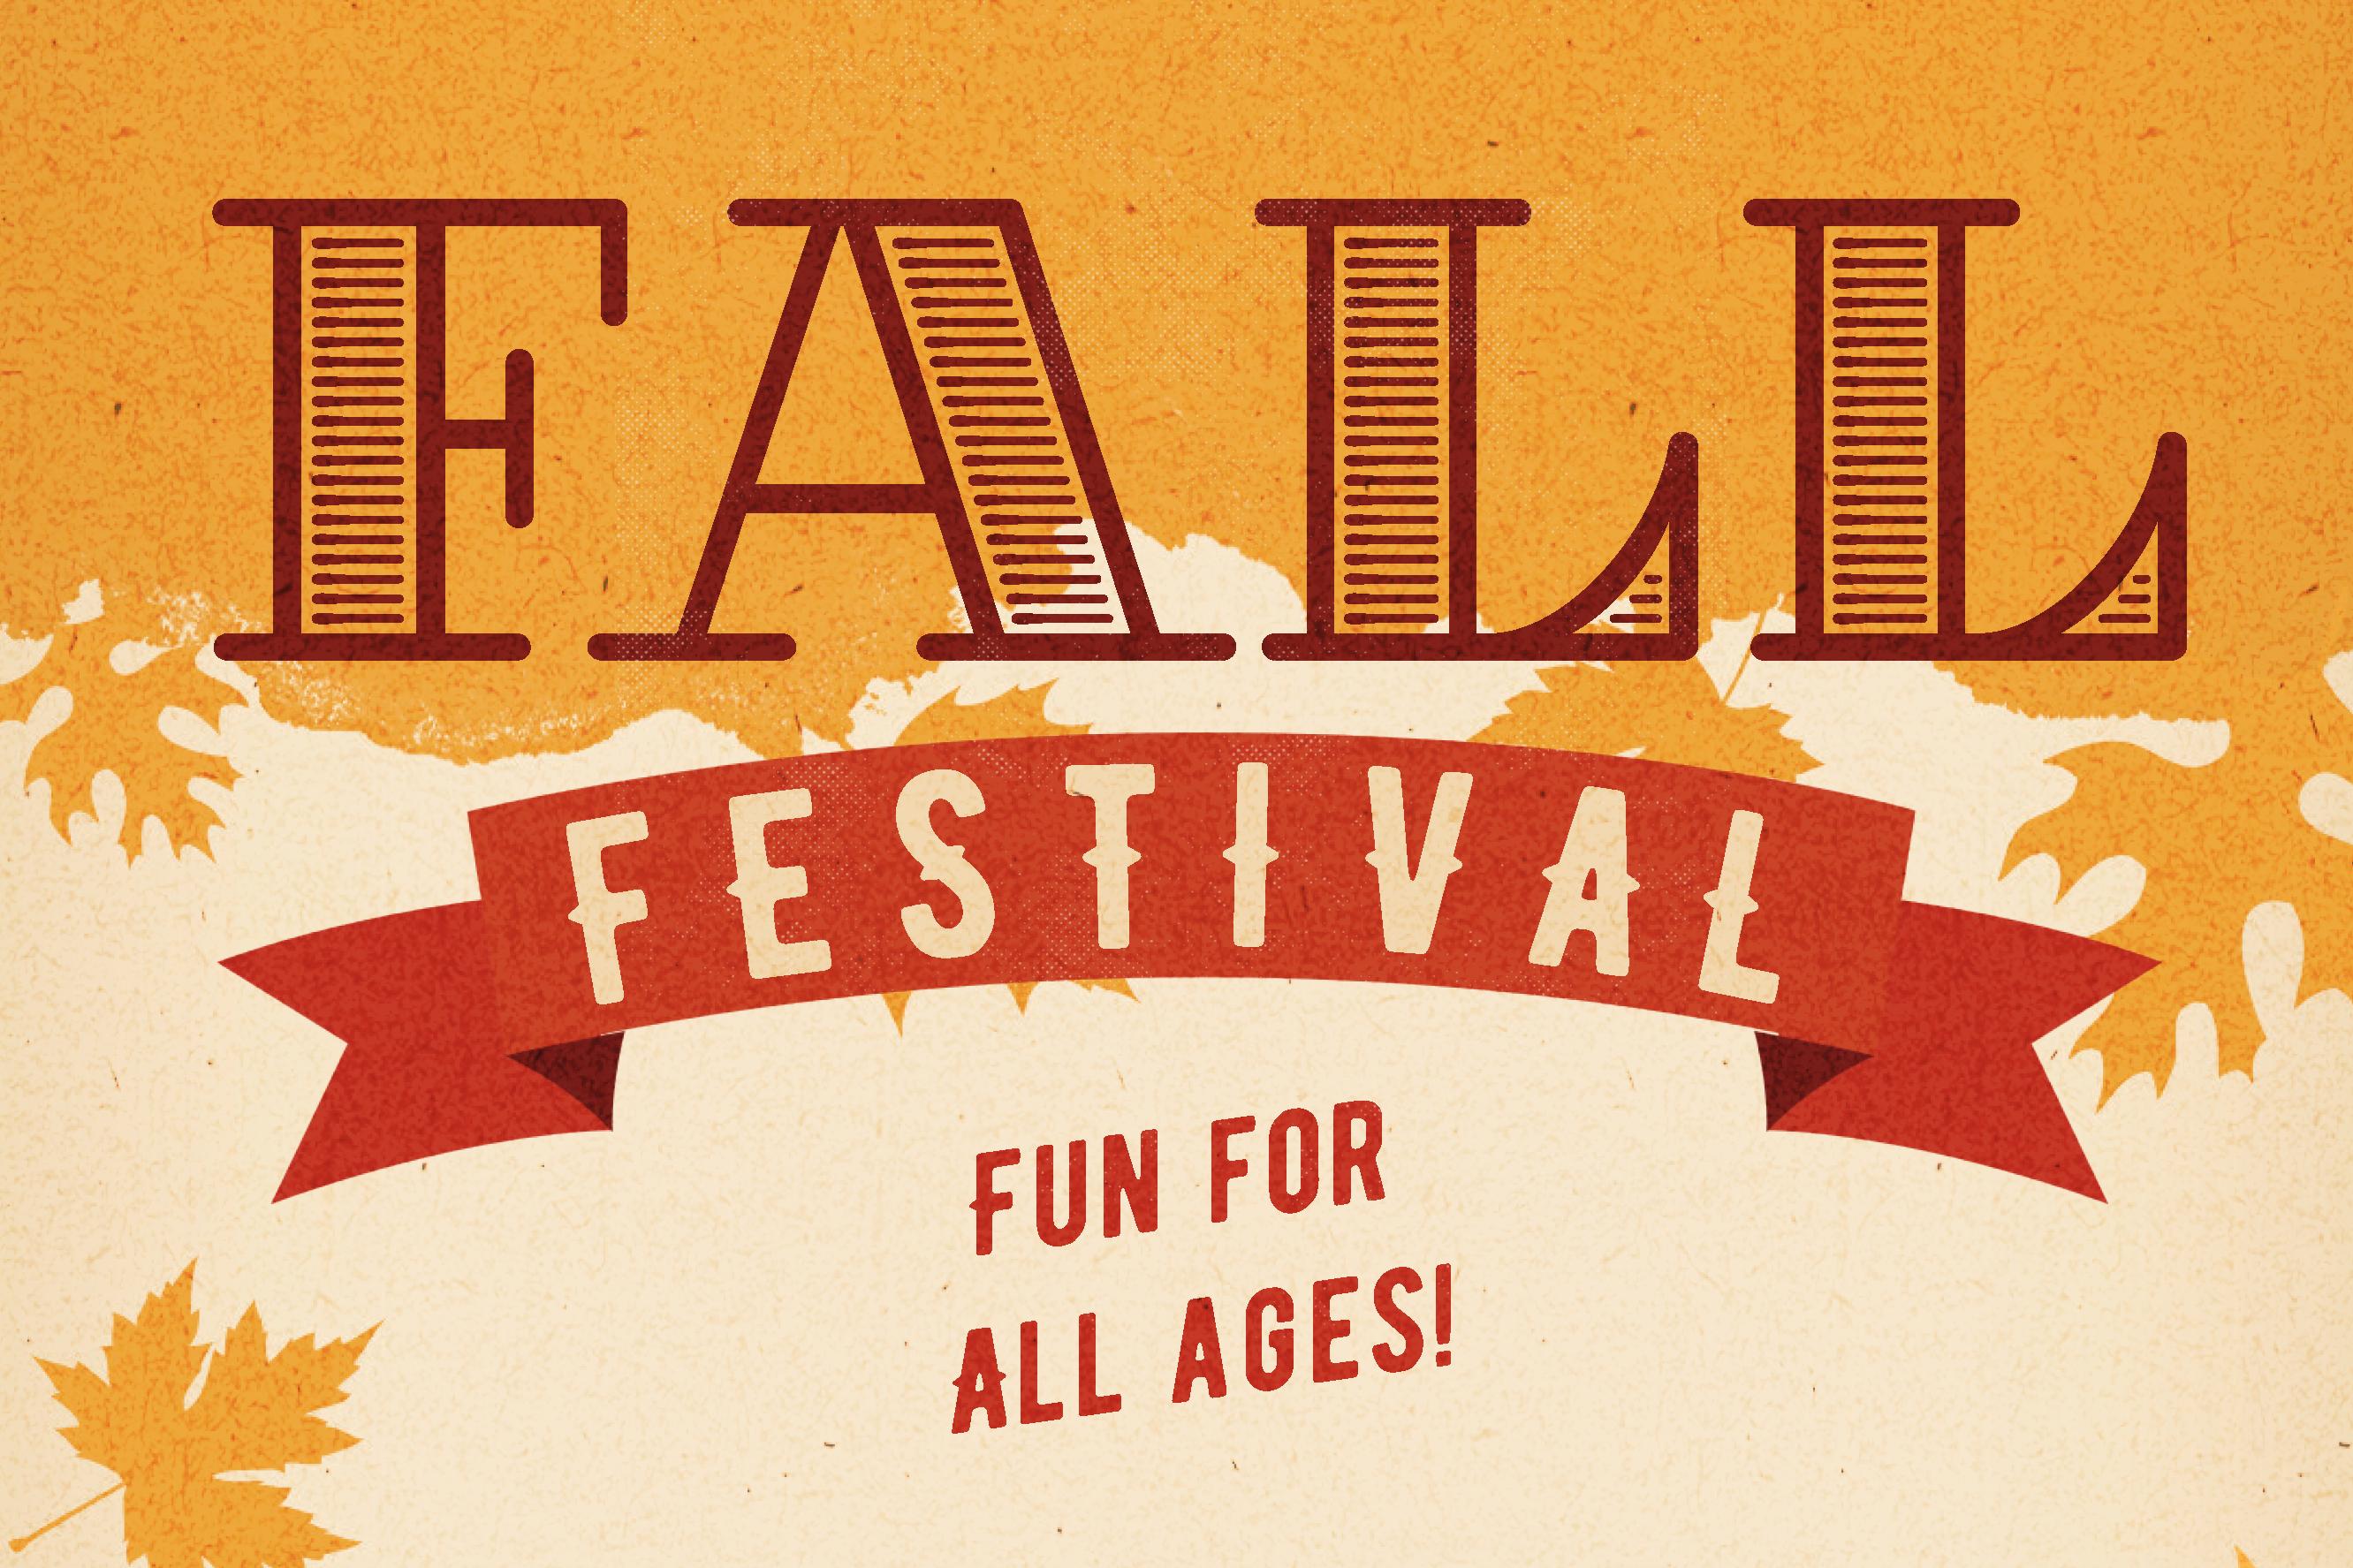 Fall Festival Web Image.png